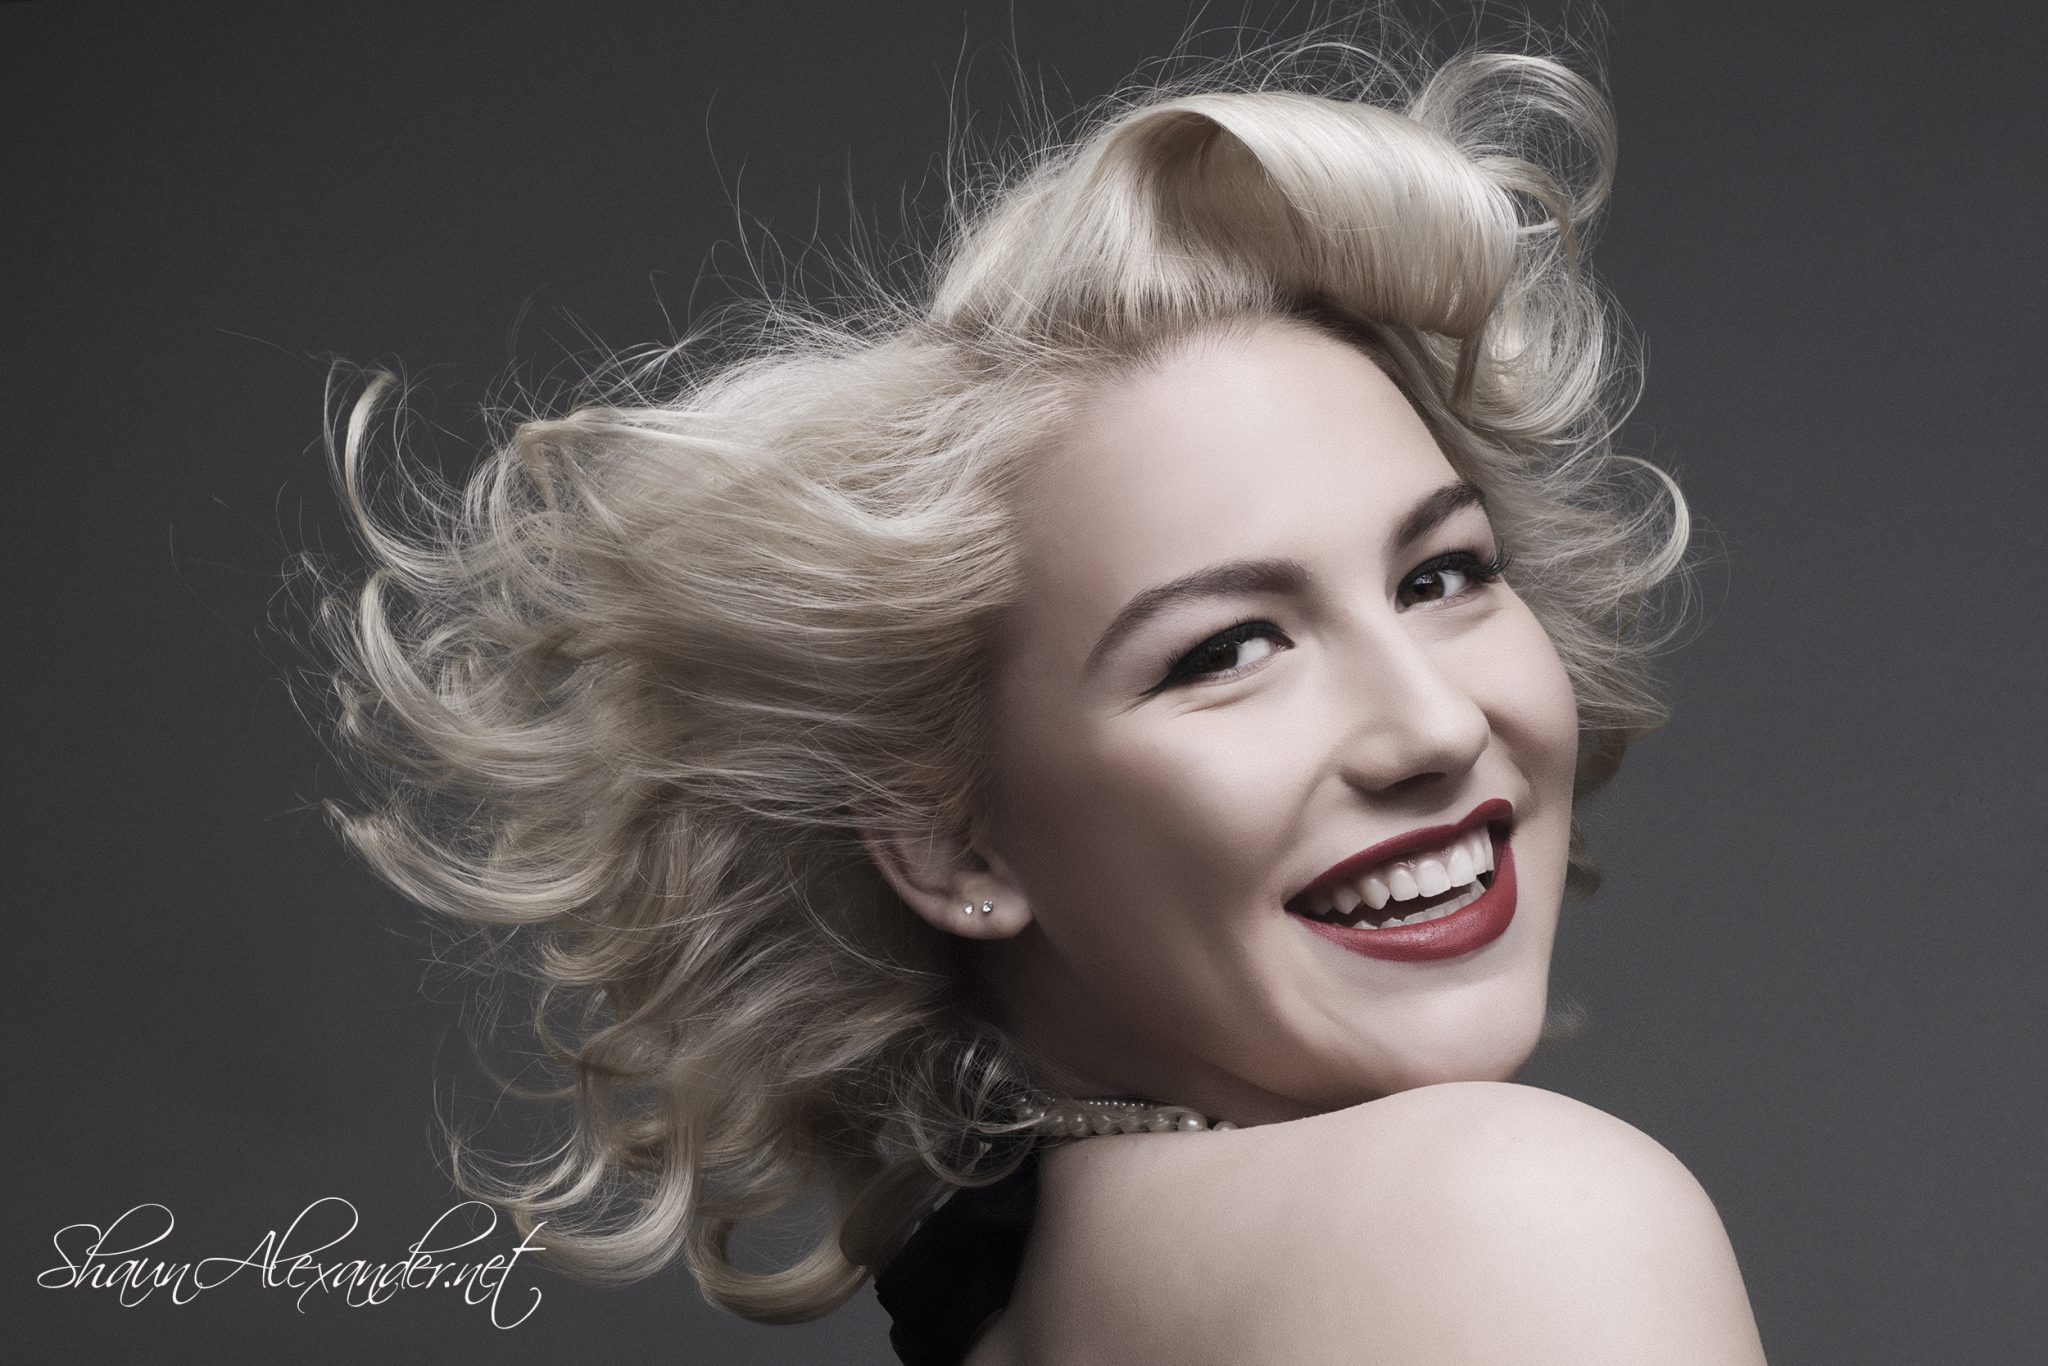 Marilyn Monroe Style photography